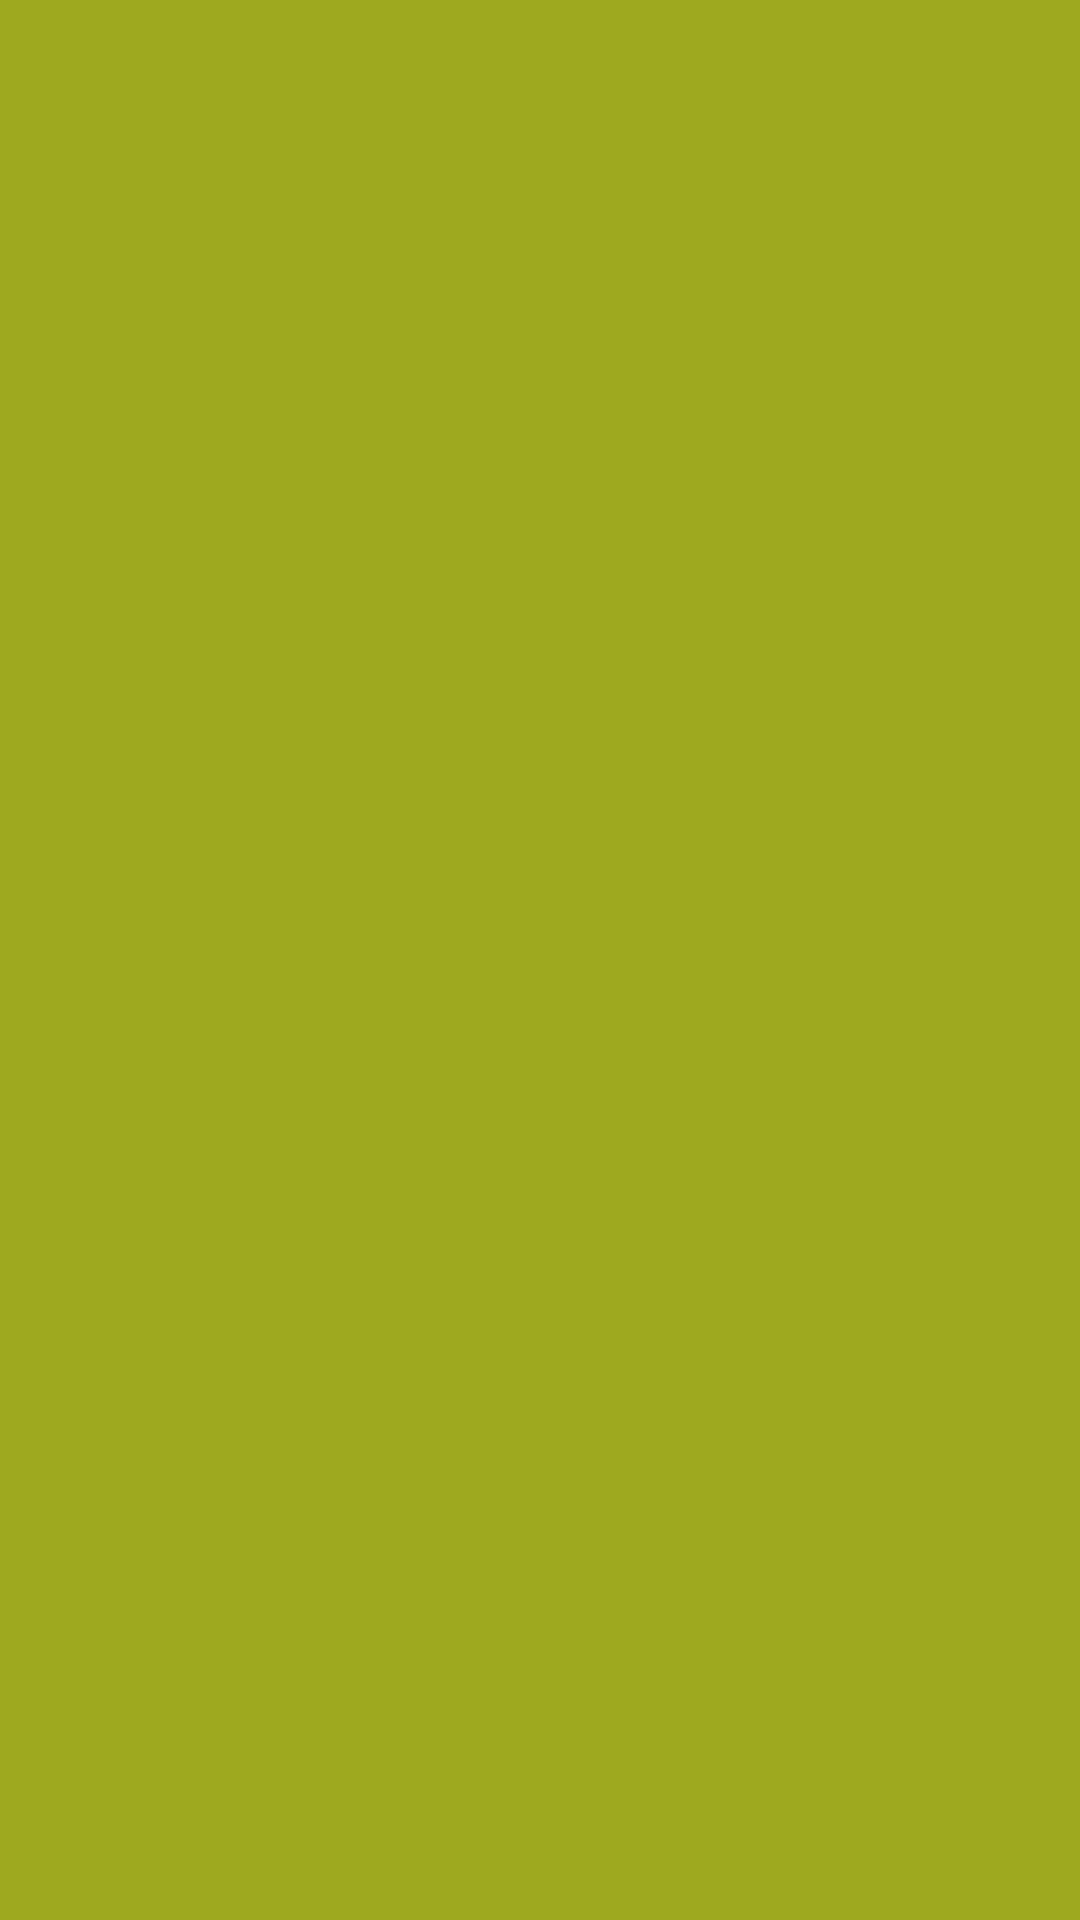 1080x1920 Citron Solid Color Background